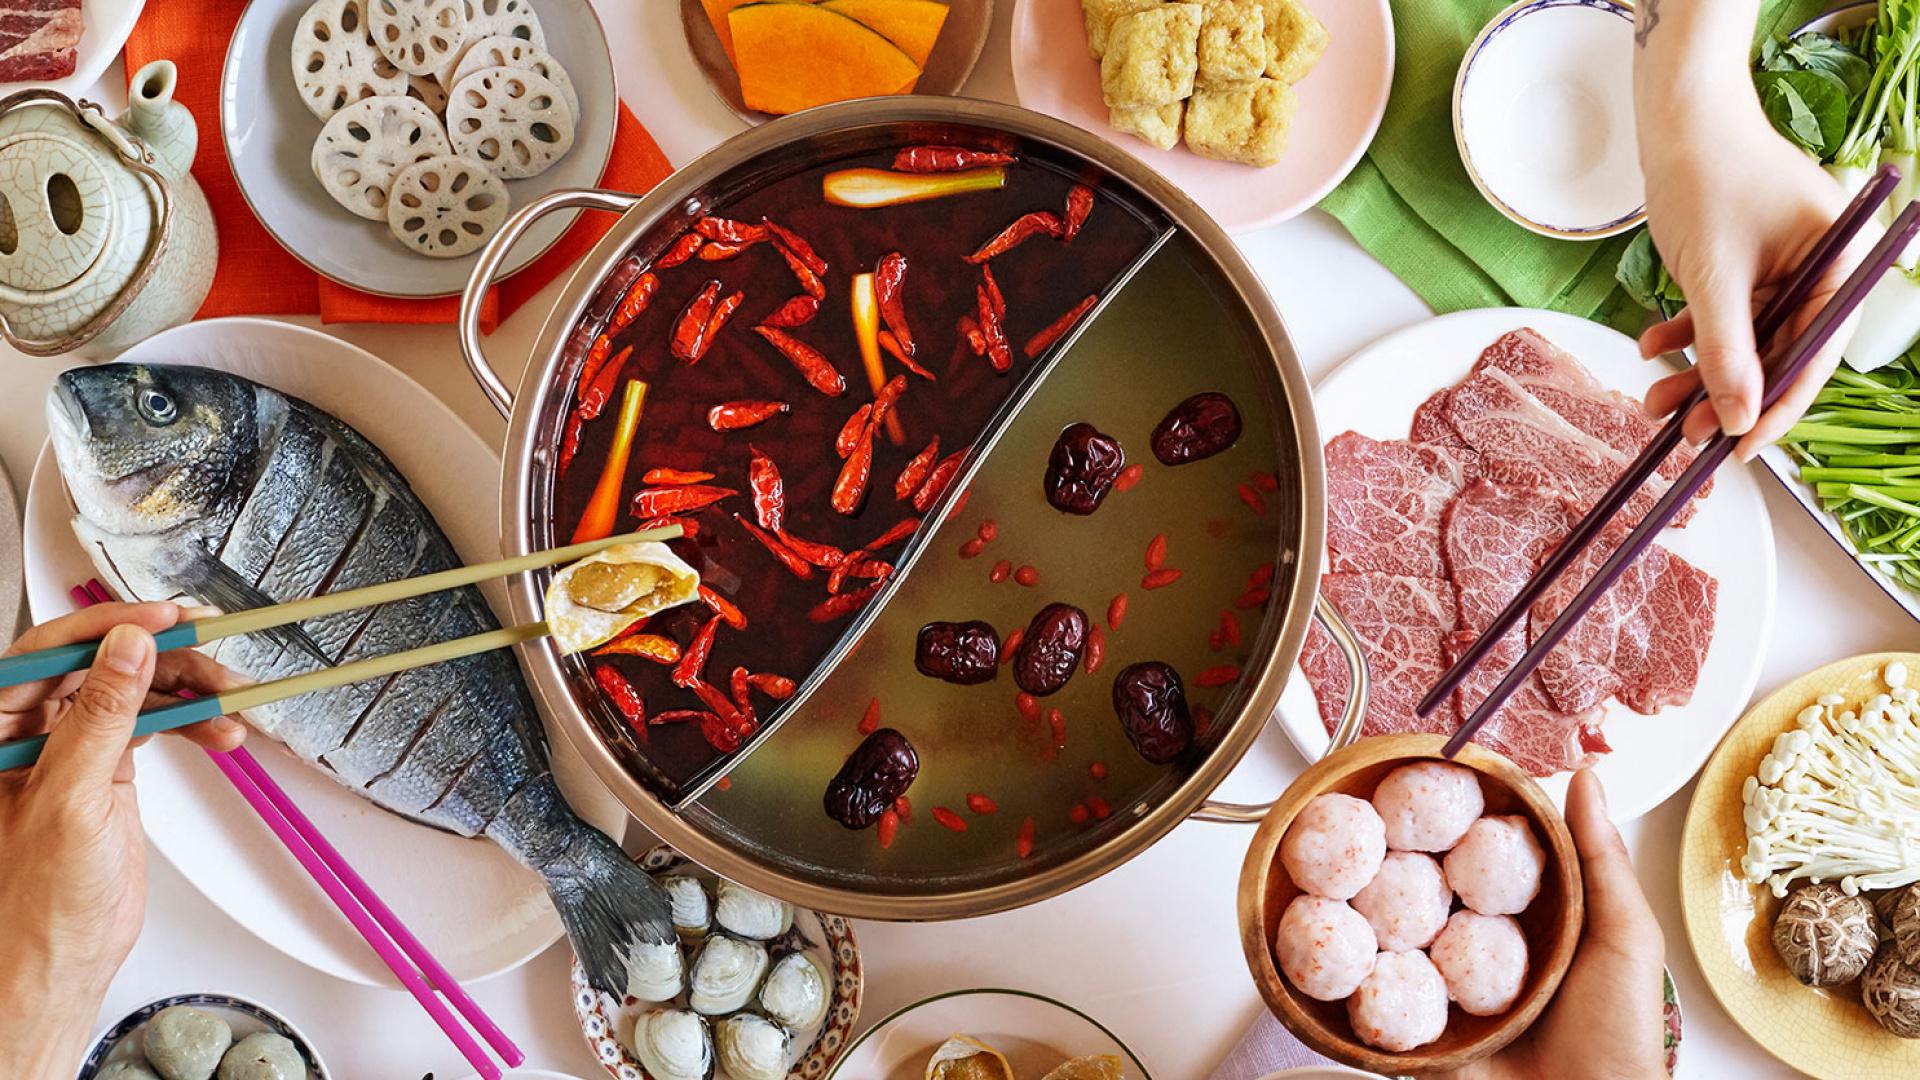 Hot pot at Shuang Shuang